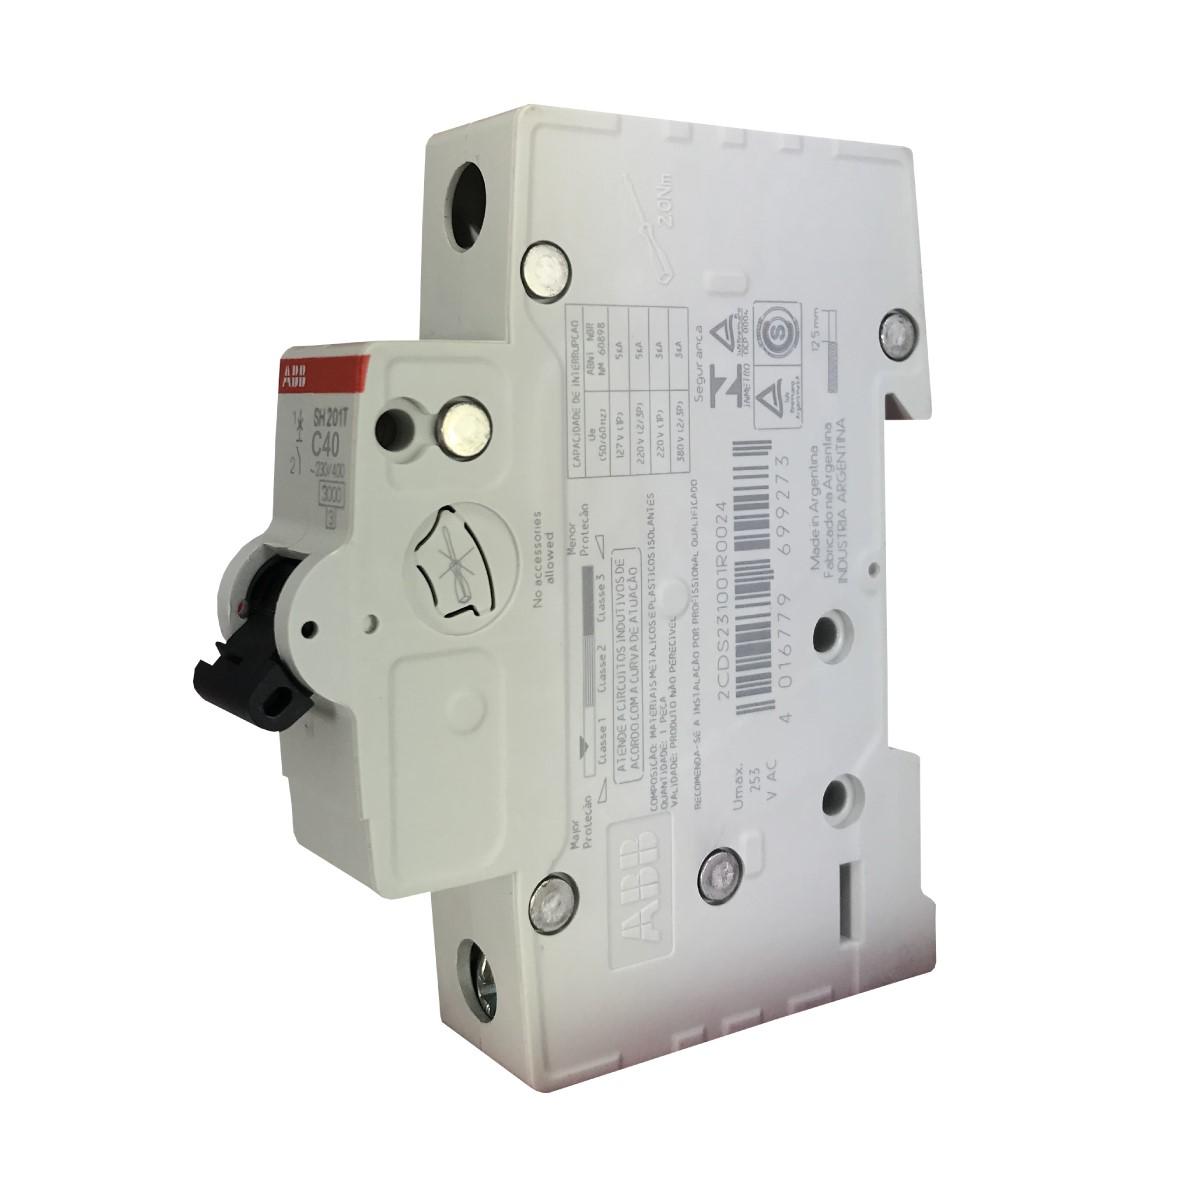 SH201 T-C40_ABB_PeR Automação Industrial